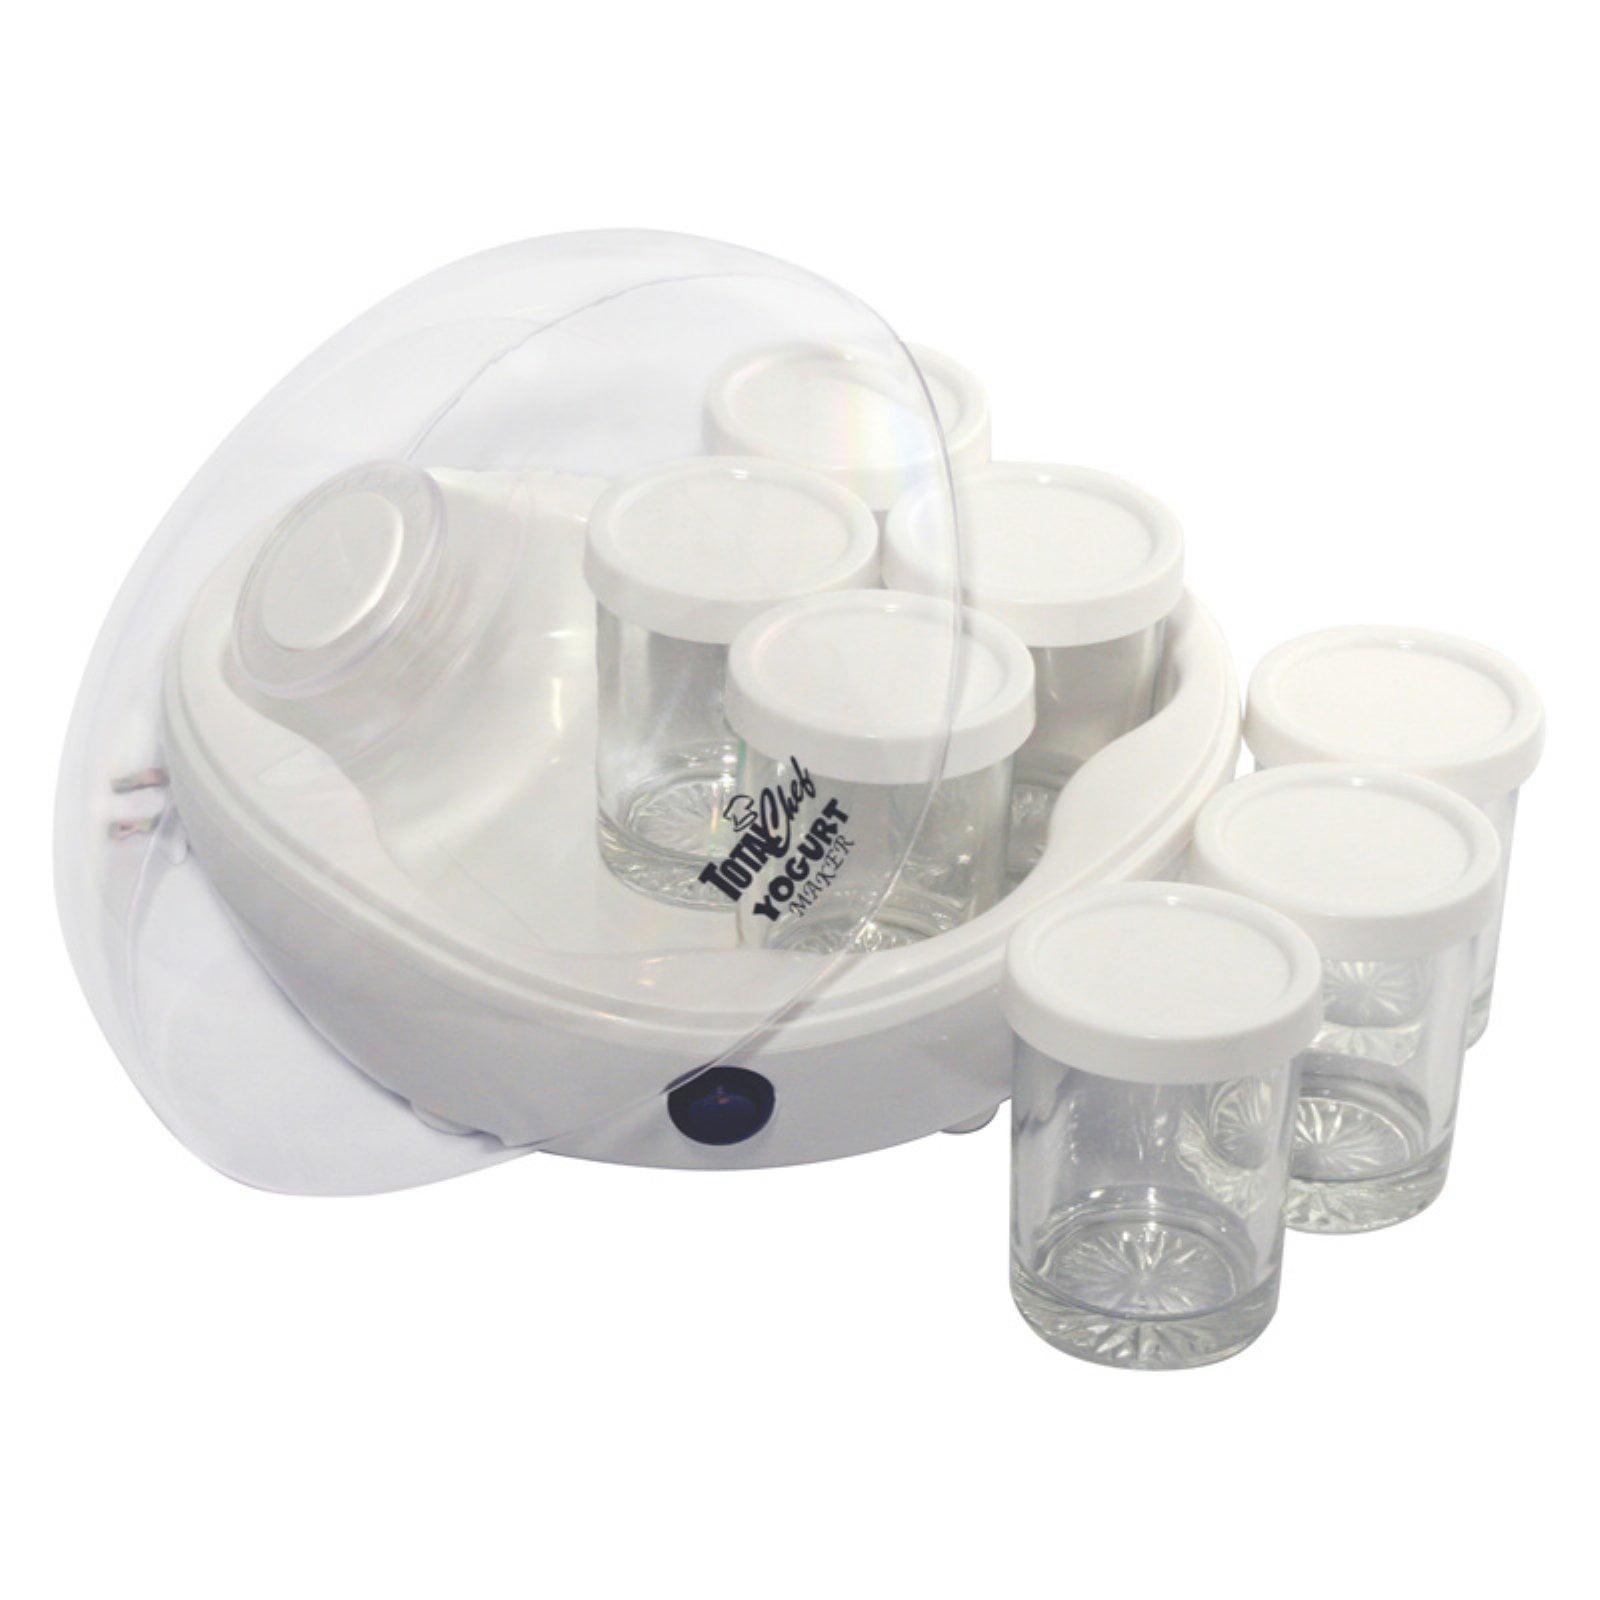 total chef yogurt maker 7 jars walmart com rh walmart com Yogurt Maker Machine Dash Yogurt Maker